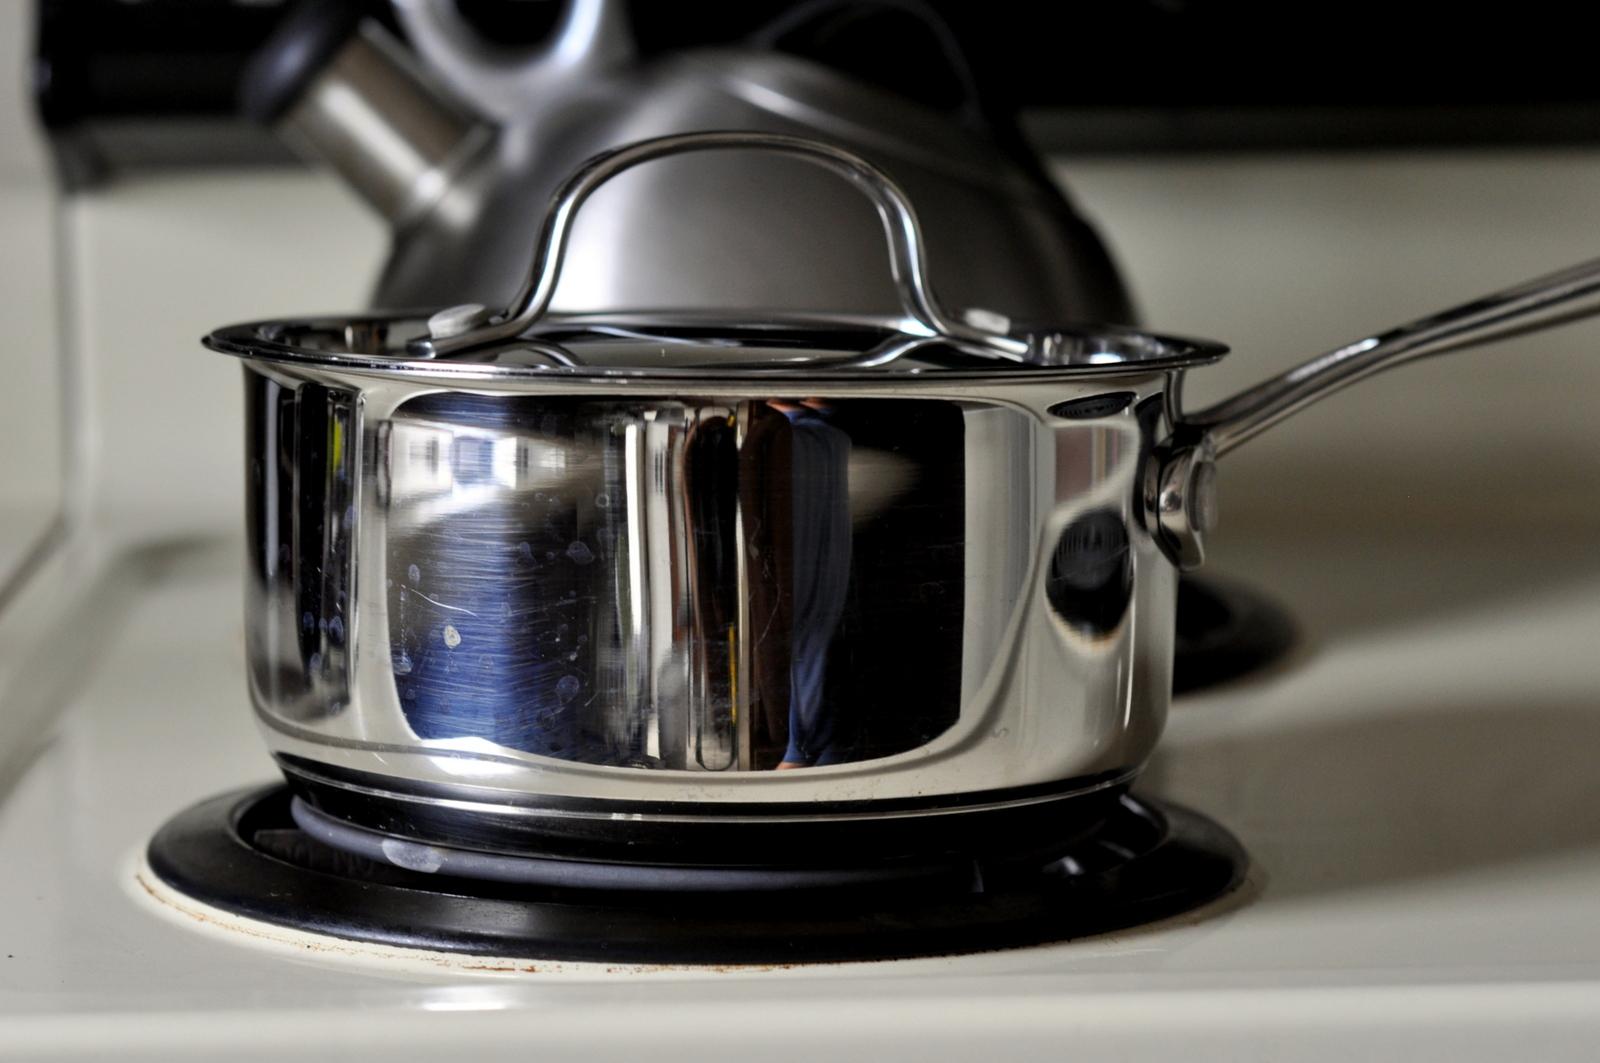 How To: Boil Eggs | Taste As You Go